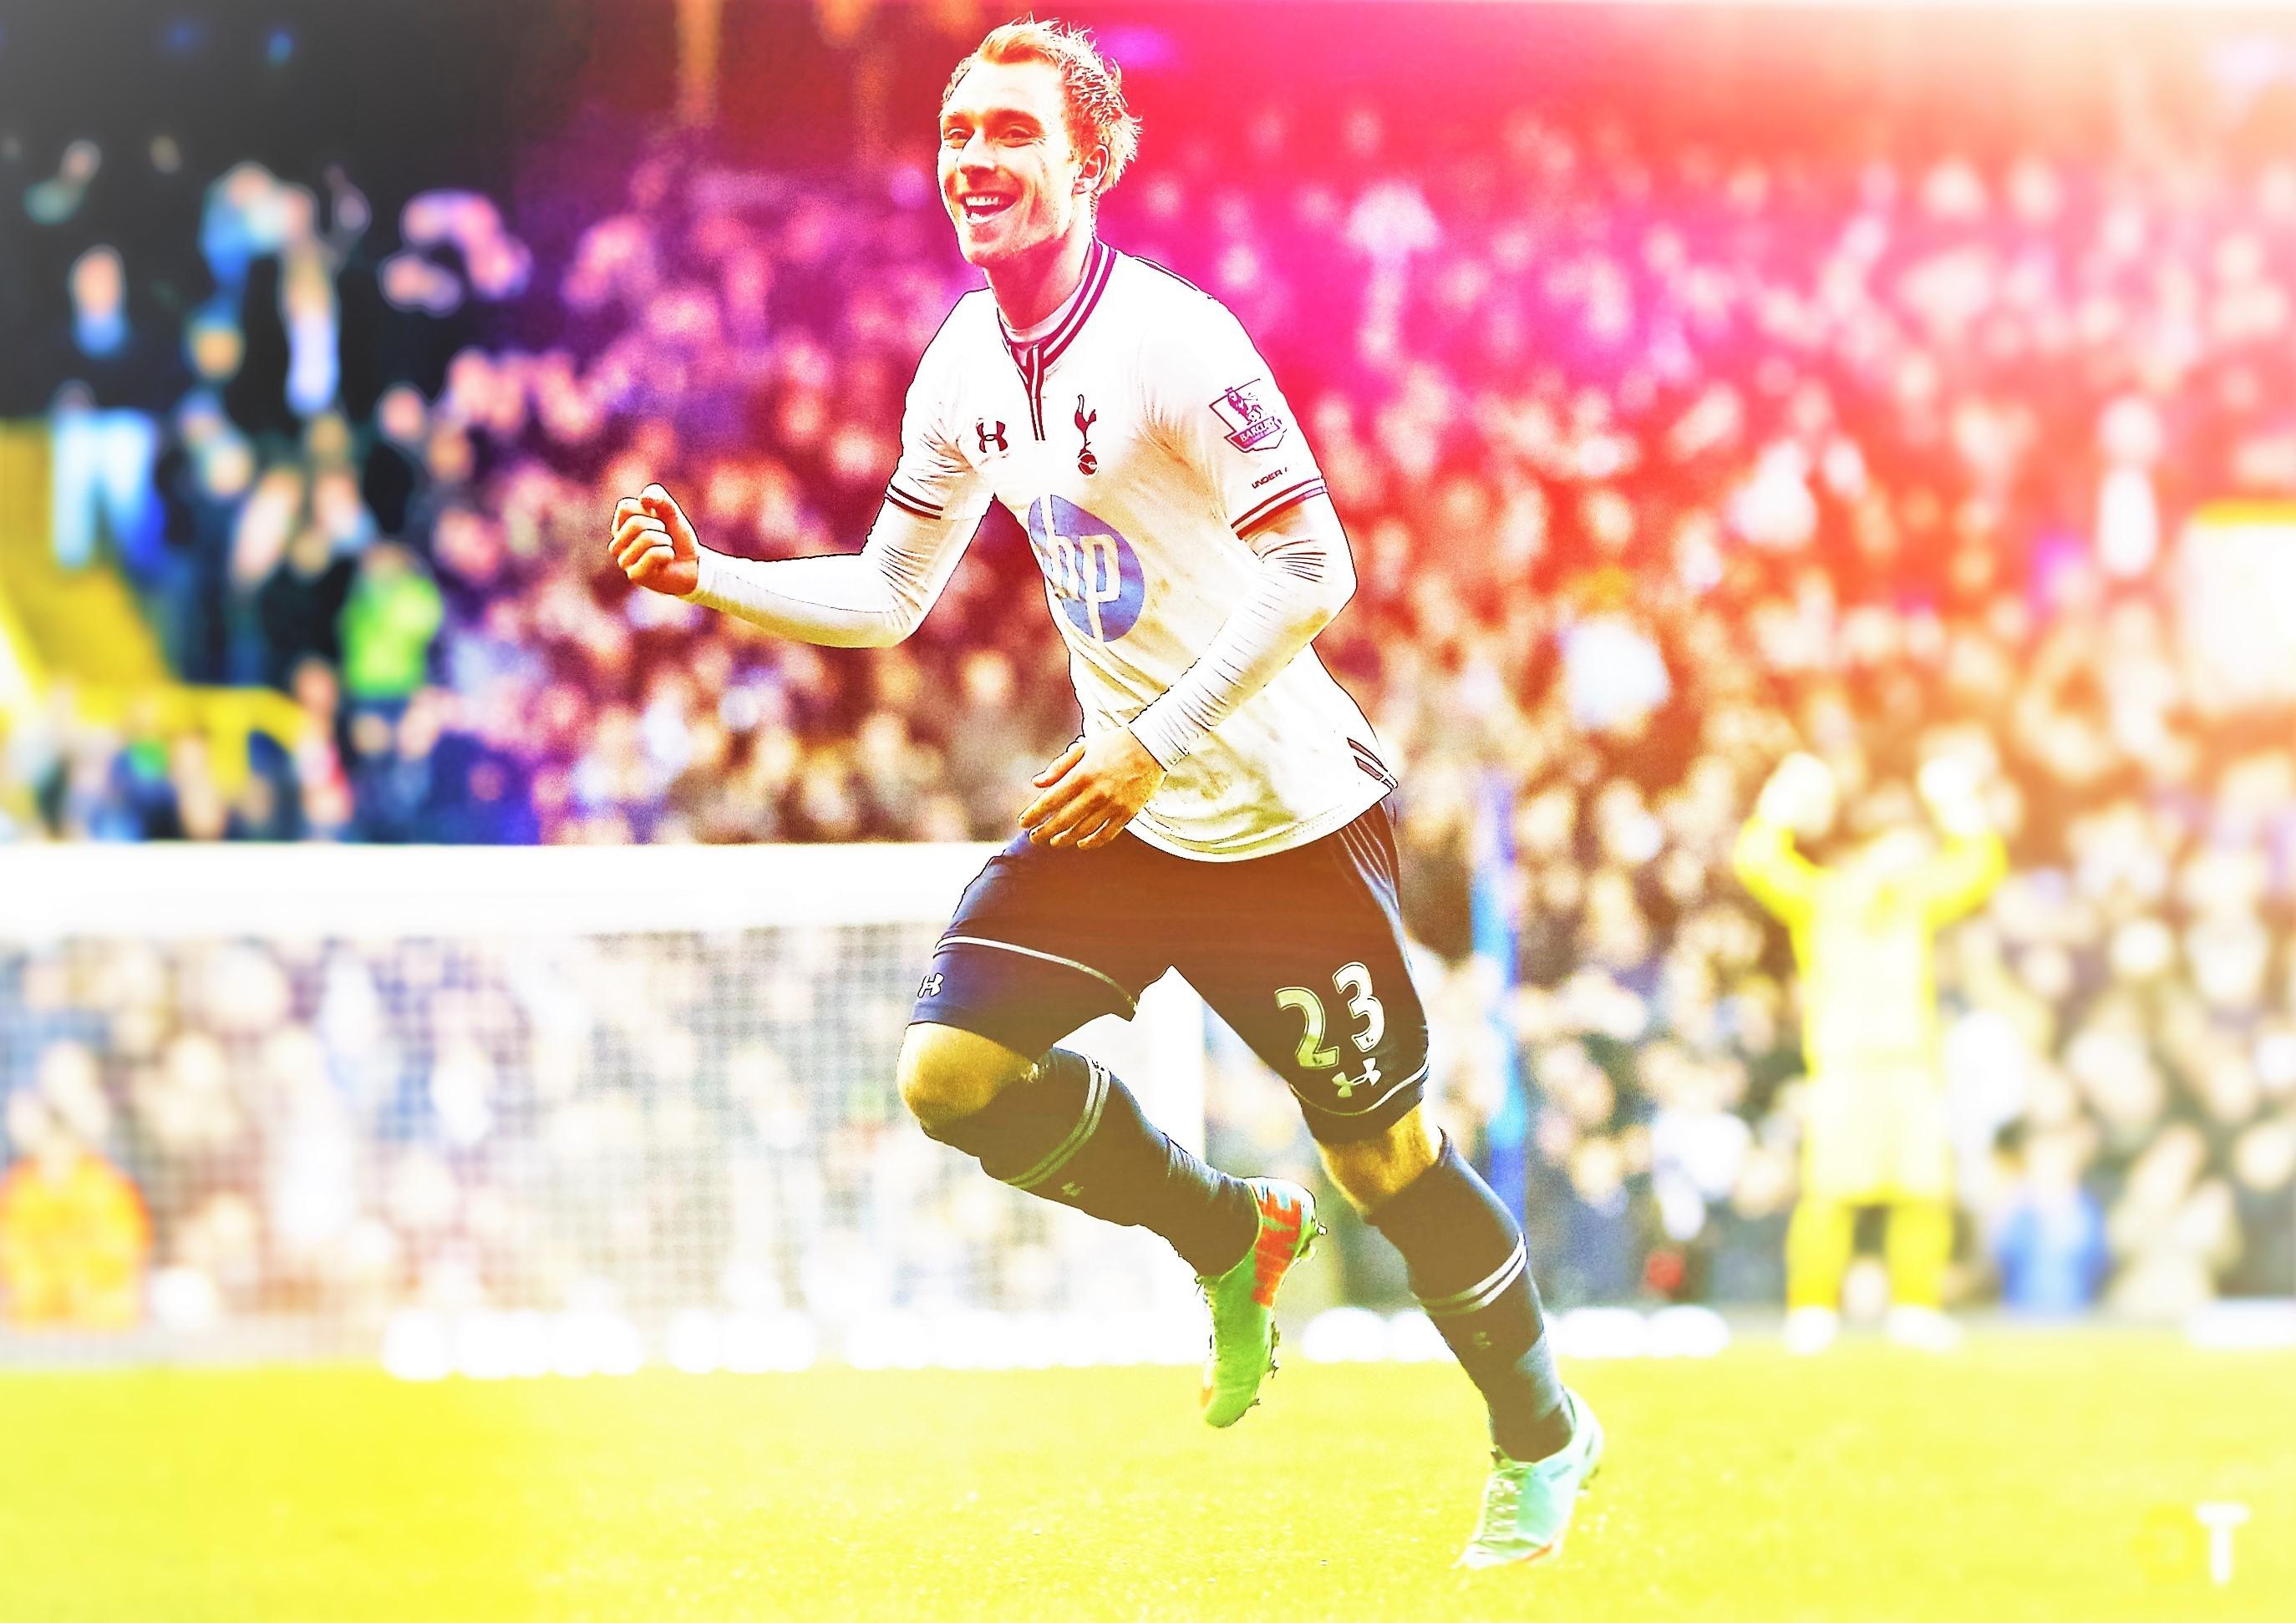 footballers, Spurs, Tottenham Hotspur Wallpapers HD / Desktop and Mobile  Backgrounds